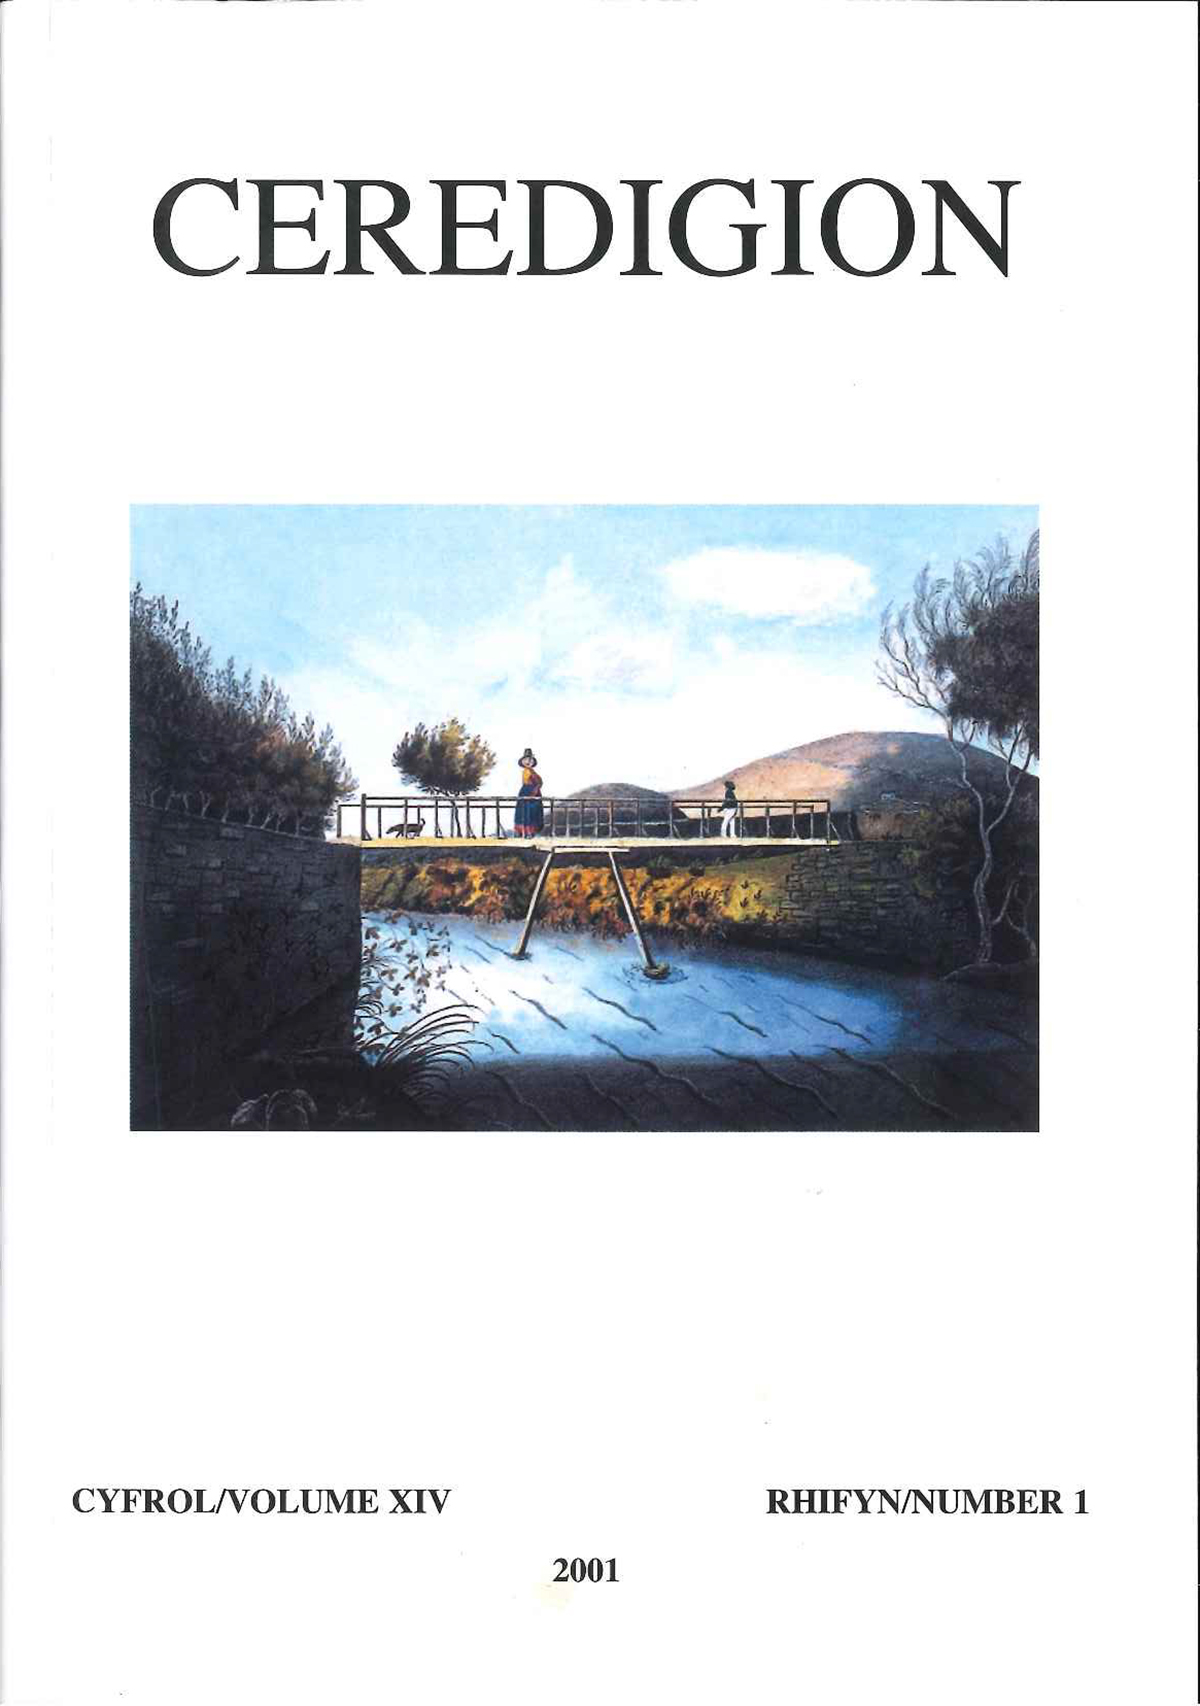 Ceredigion Journal of the Ceredigion Antiquarian Society Vol XIV, No I 2001 - ISBN 0069 2263